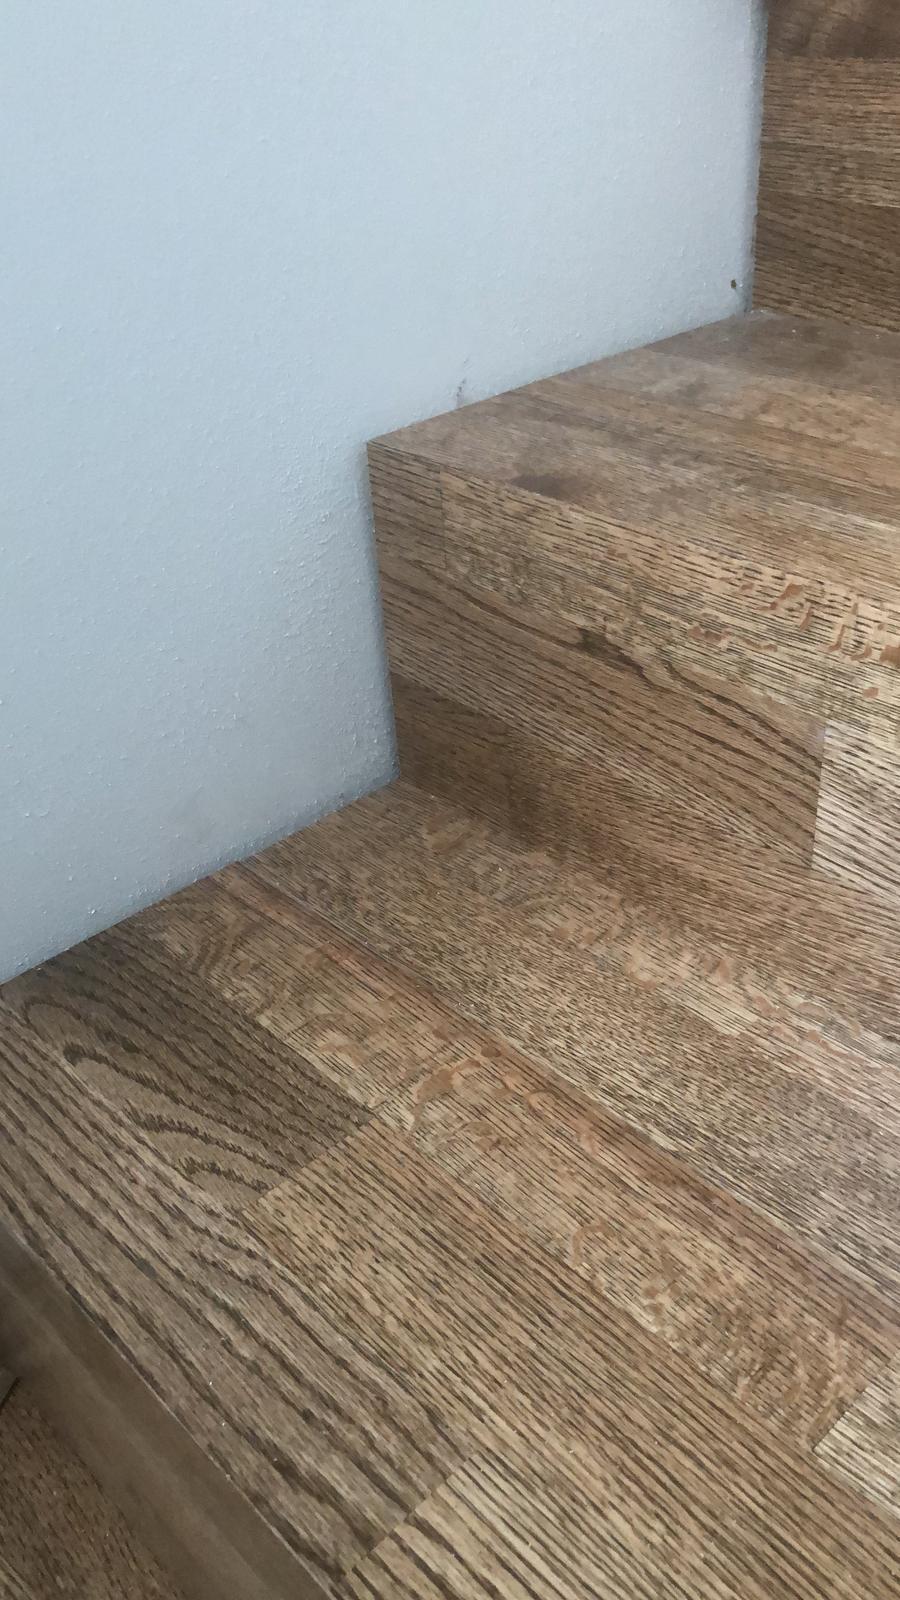 Obklad schodiska drevenými 3-vrst parketami - Pre viac info nás kontaktujte - https://www.kupsipodlahu.sk/kontakty